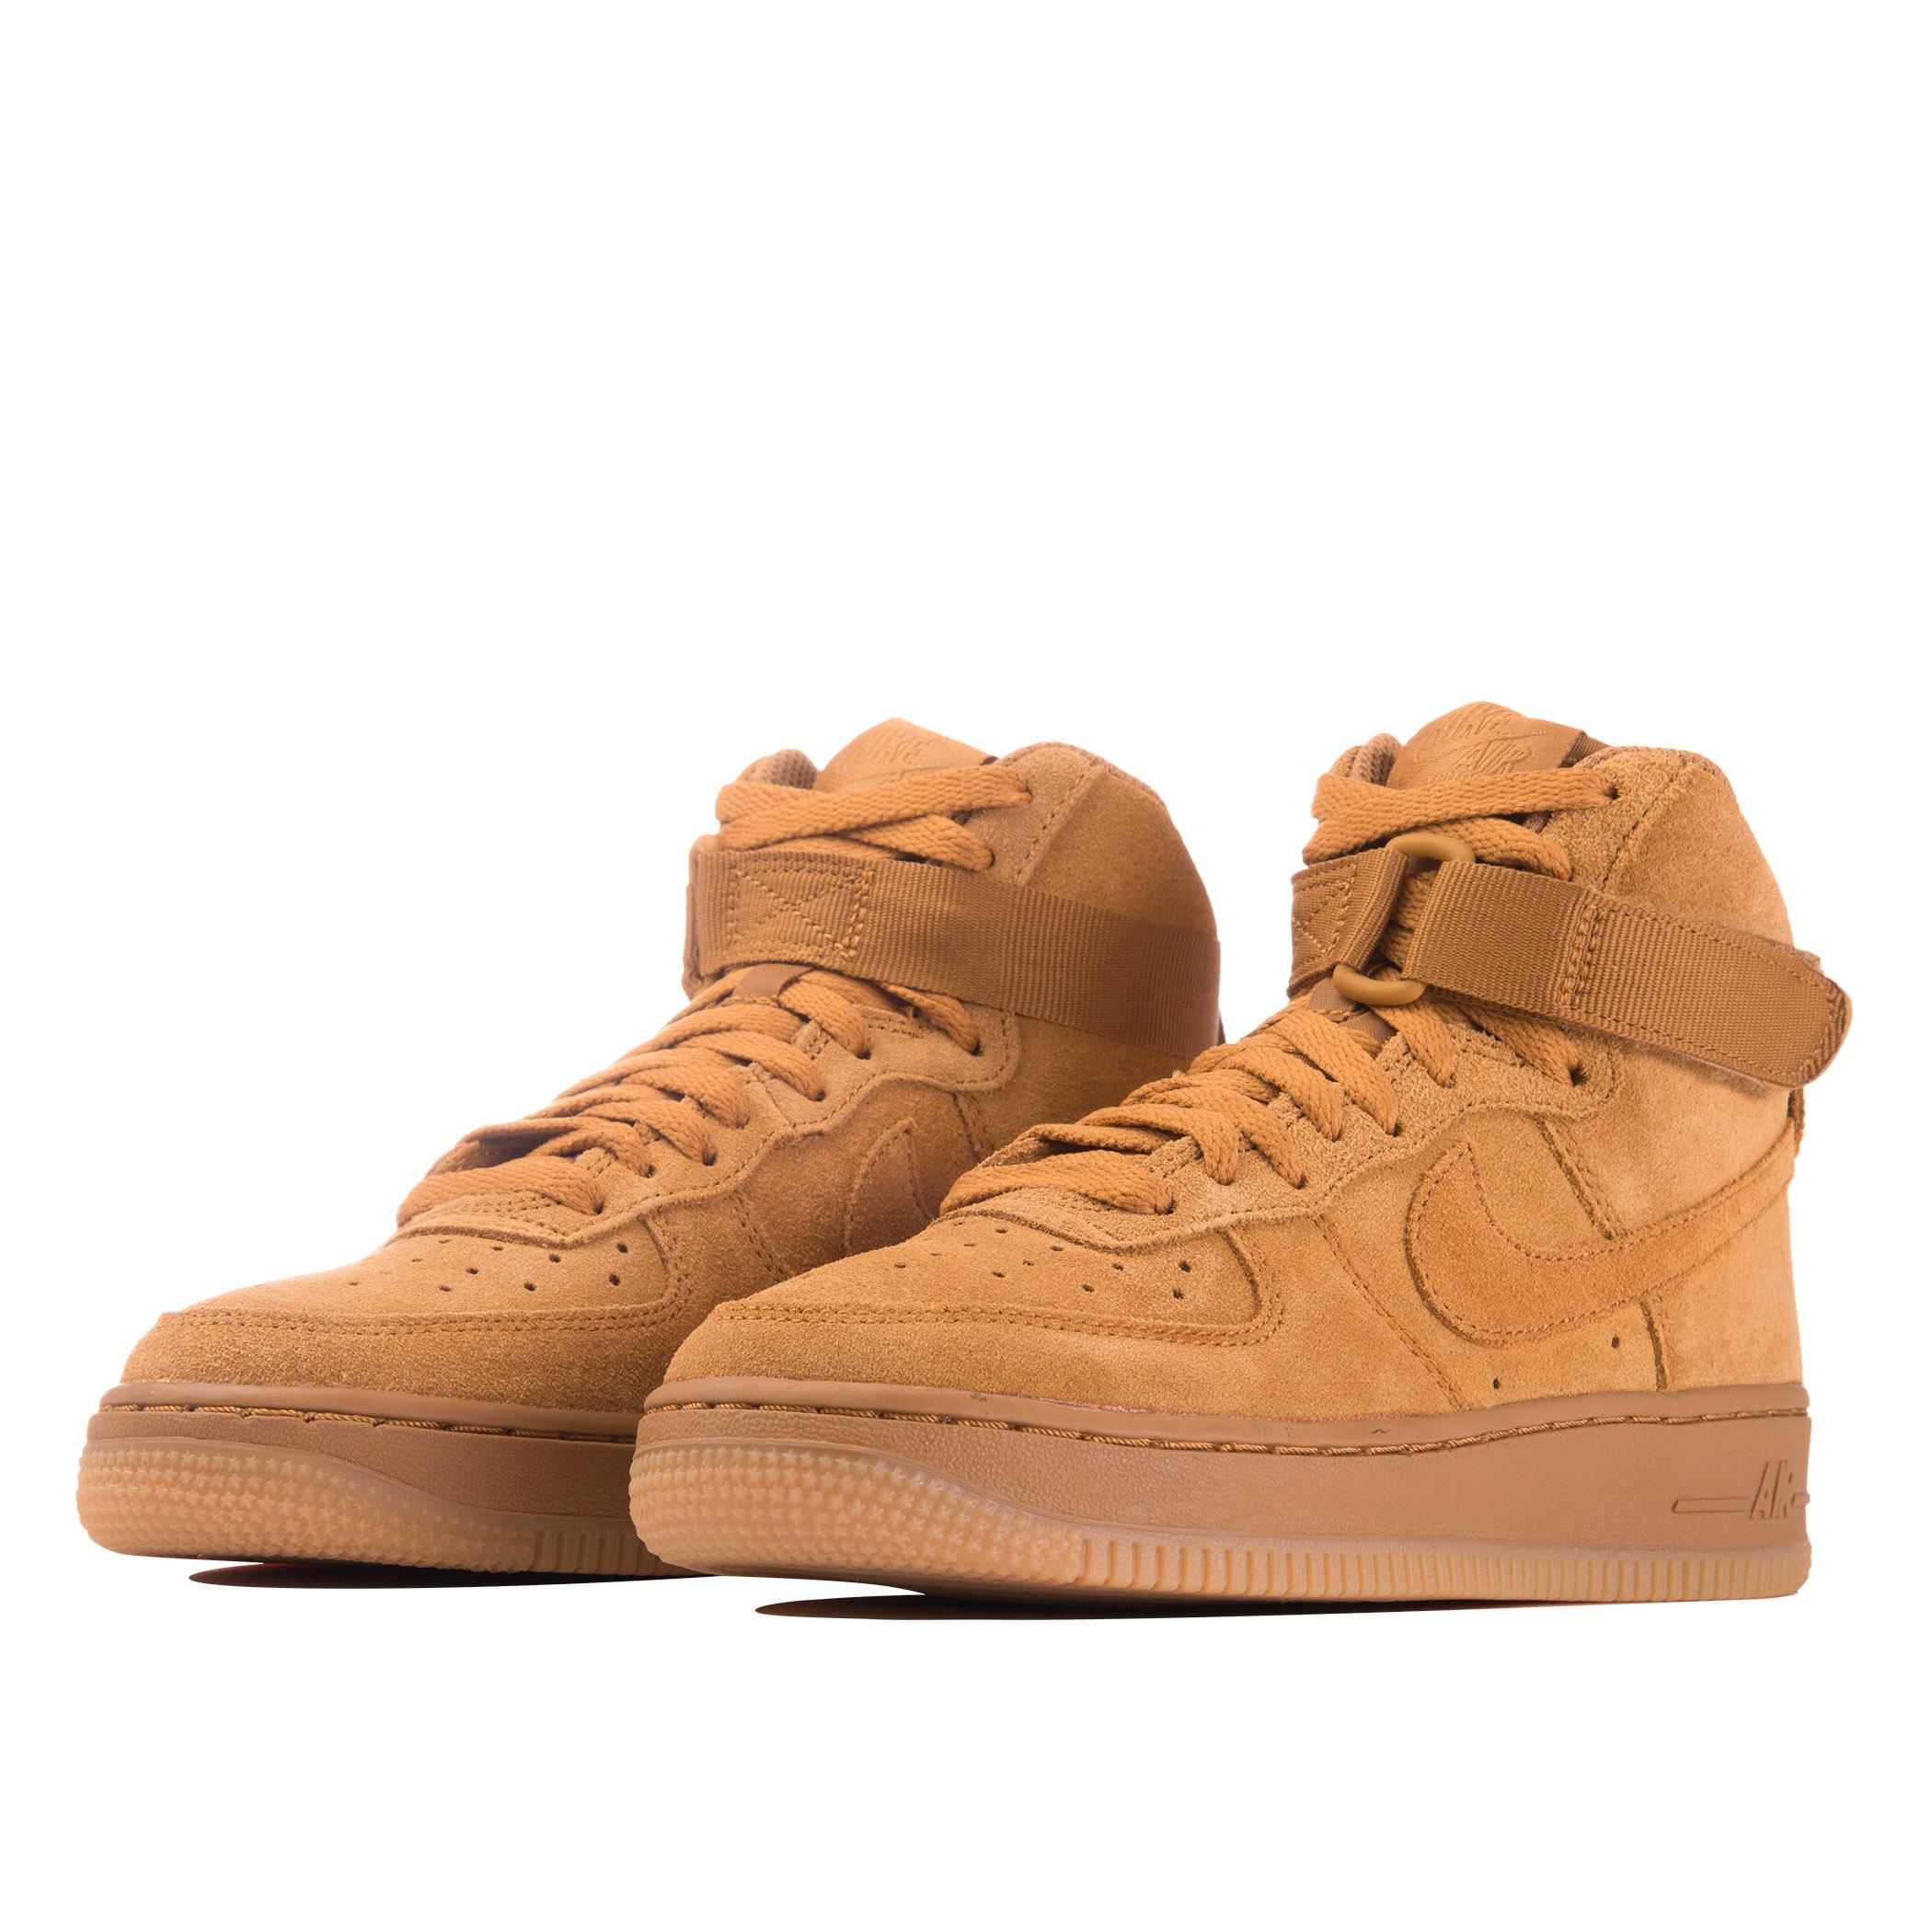 1bc2eb8c Подростковые кроссовки Nike Air Force 1 High LV8 (GS) Wheat/Gum Light Brown